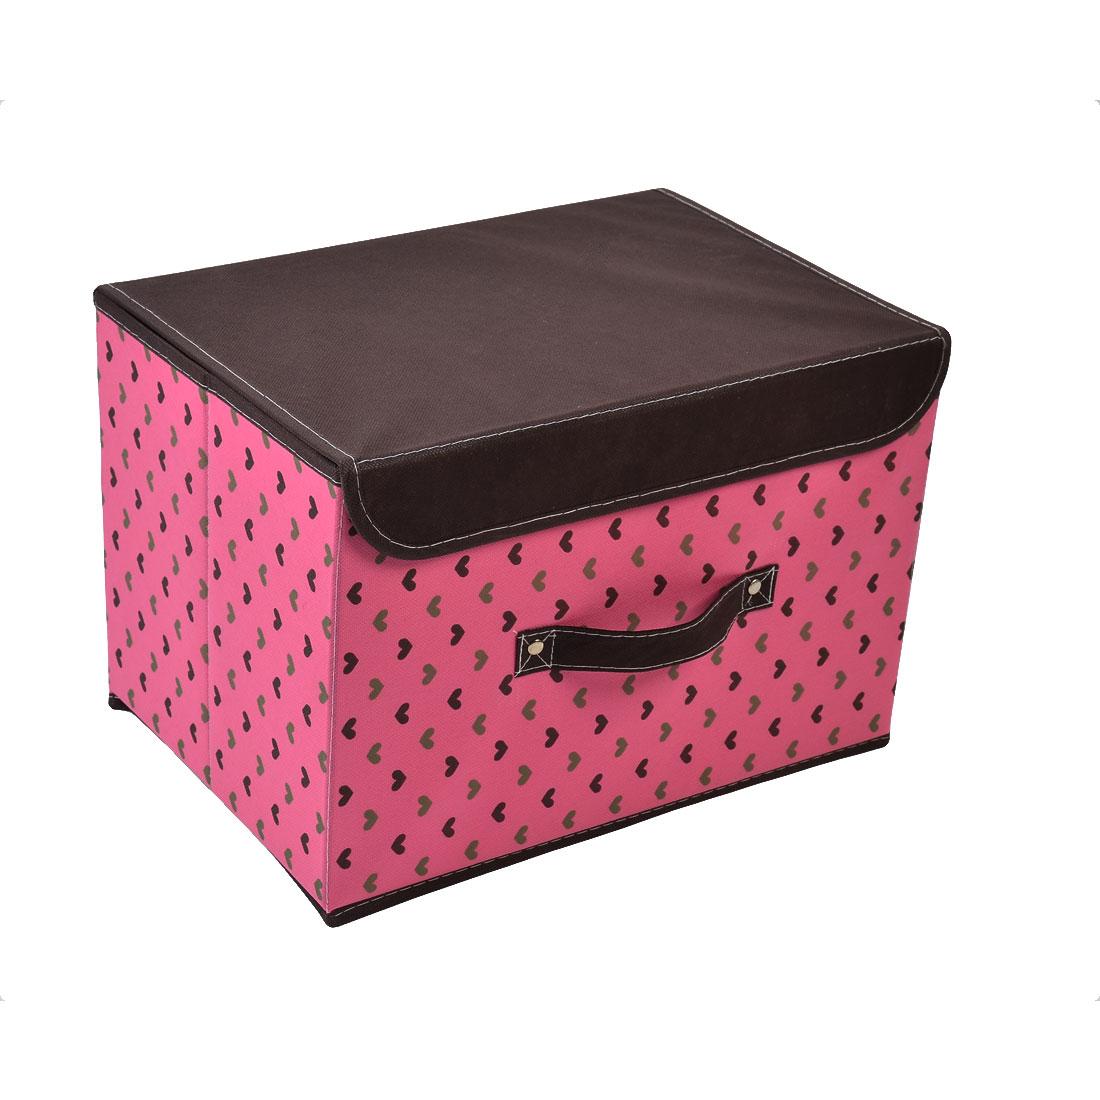 Non-woven Fabric Heart Pattern Sundries Storage Box Brown Fuchsia 37cm x 25cm x 25cm